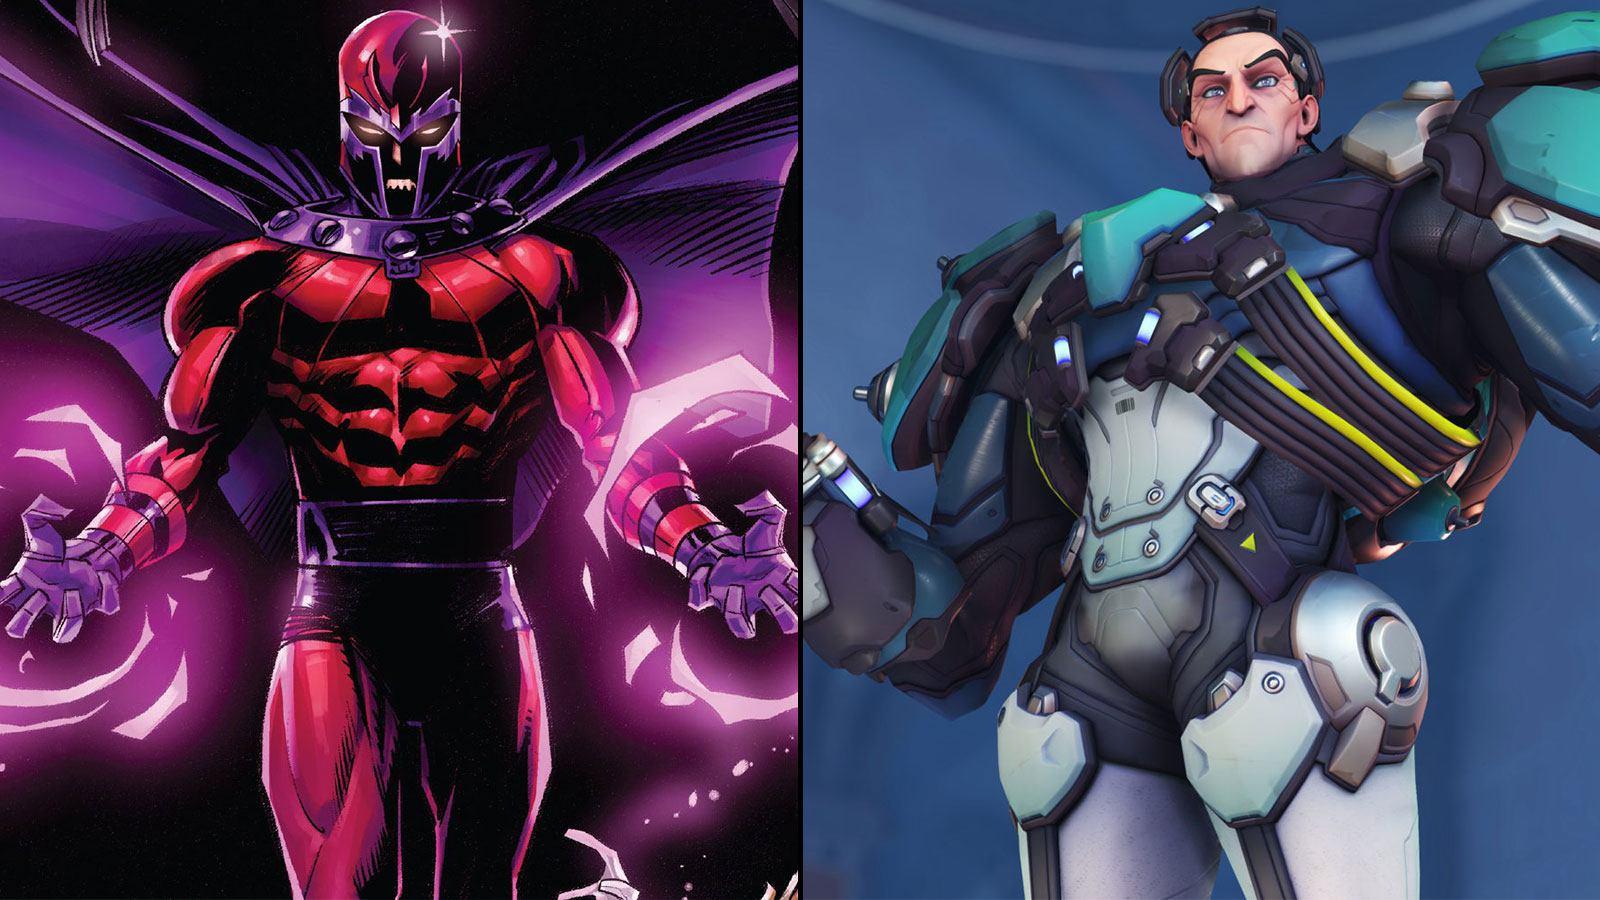 Sigma en skin Magneto